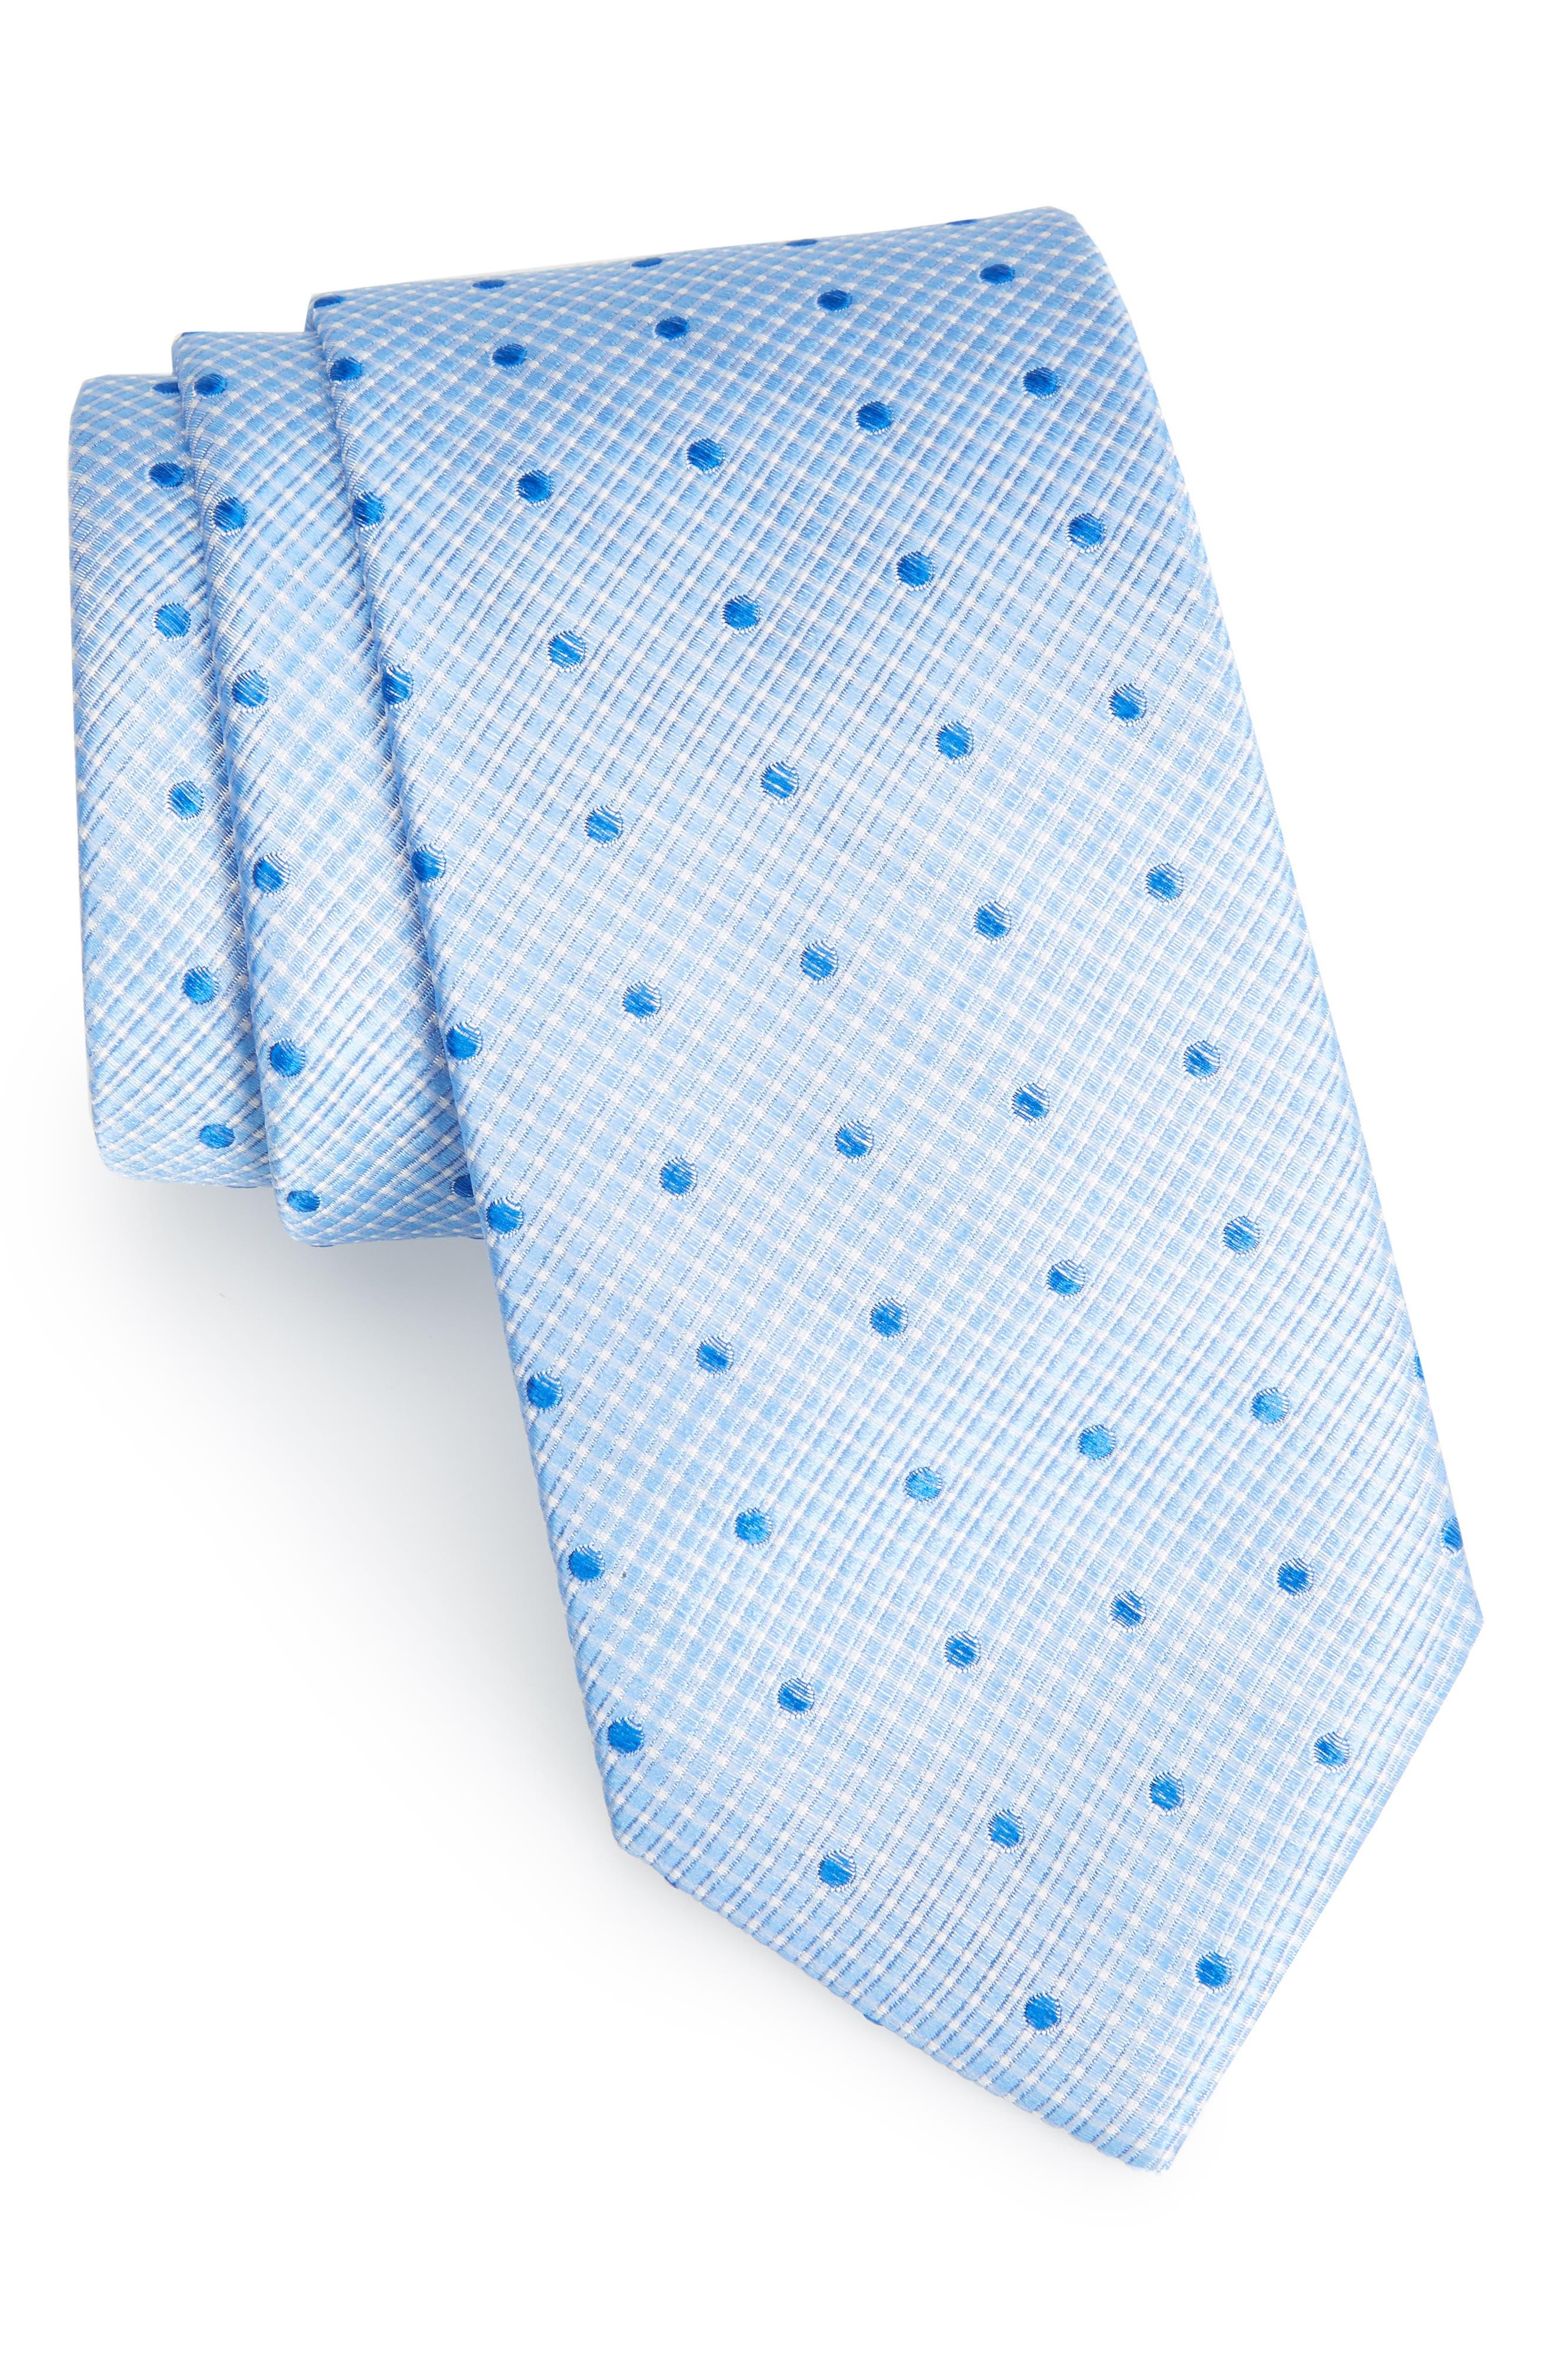 Drayton Dot Silk Tie,                         Main,                         color, BLUE